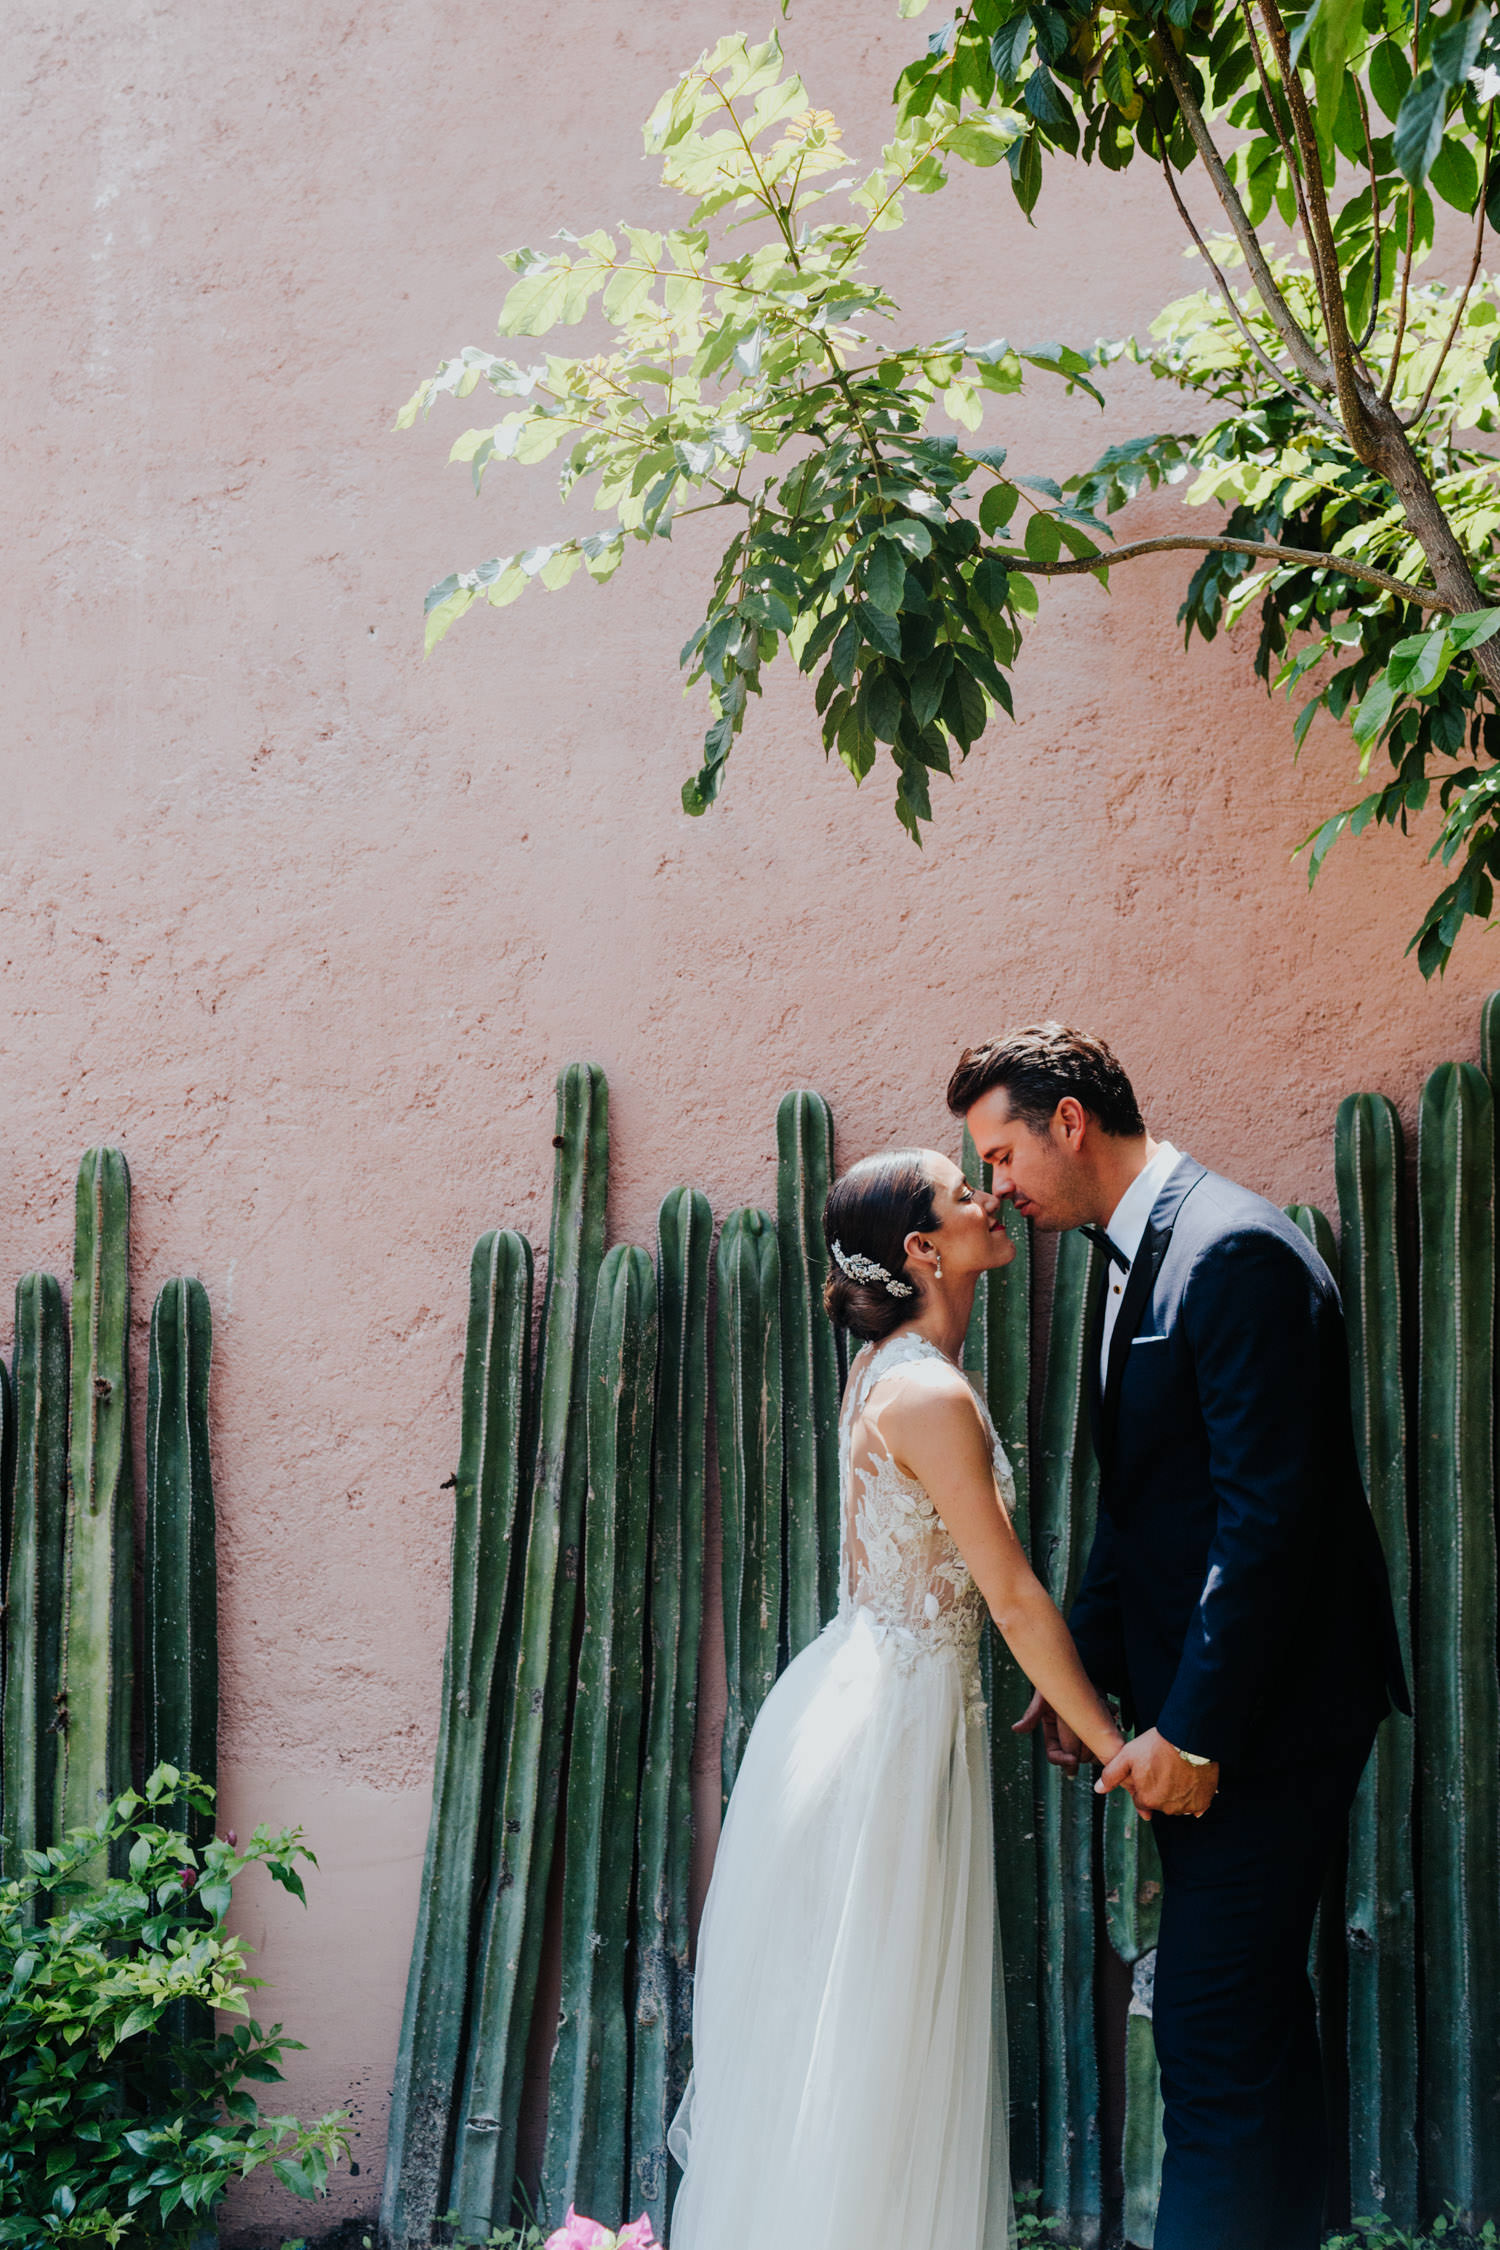 San-Miguel-de-Allende-Wedding-Photography-Parroquia-Instituto-Boda-Fotografia-Fer-Sergio-Pierce-Lifestyle-Photography0141.JPG